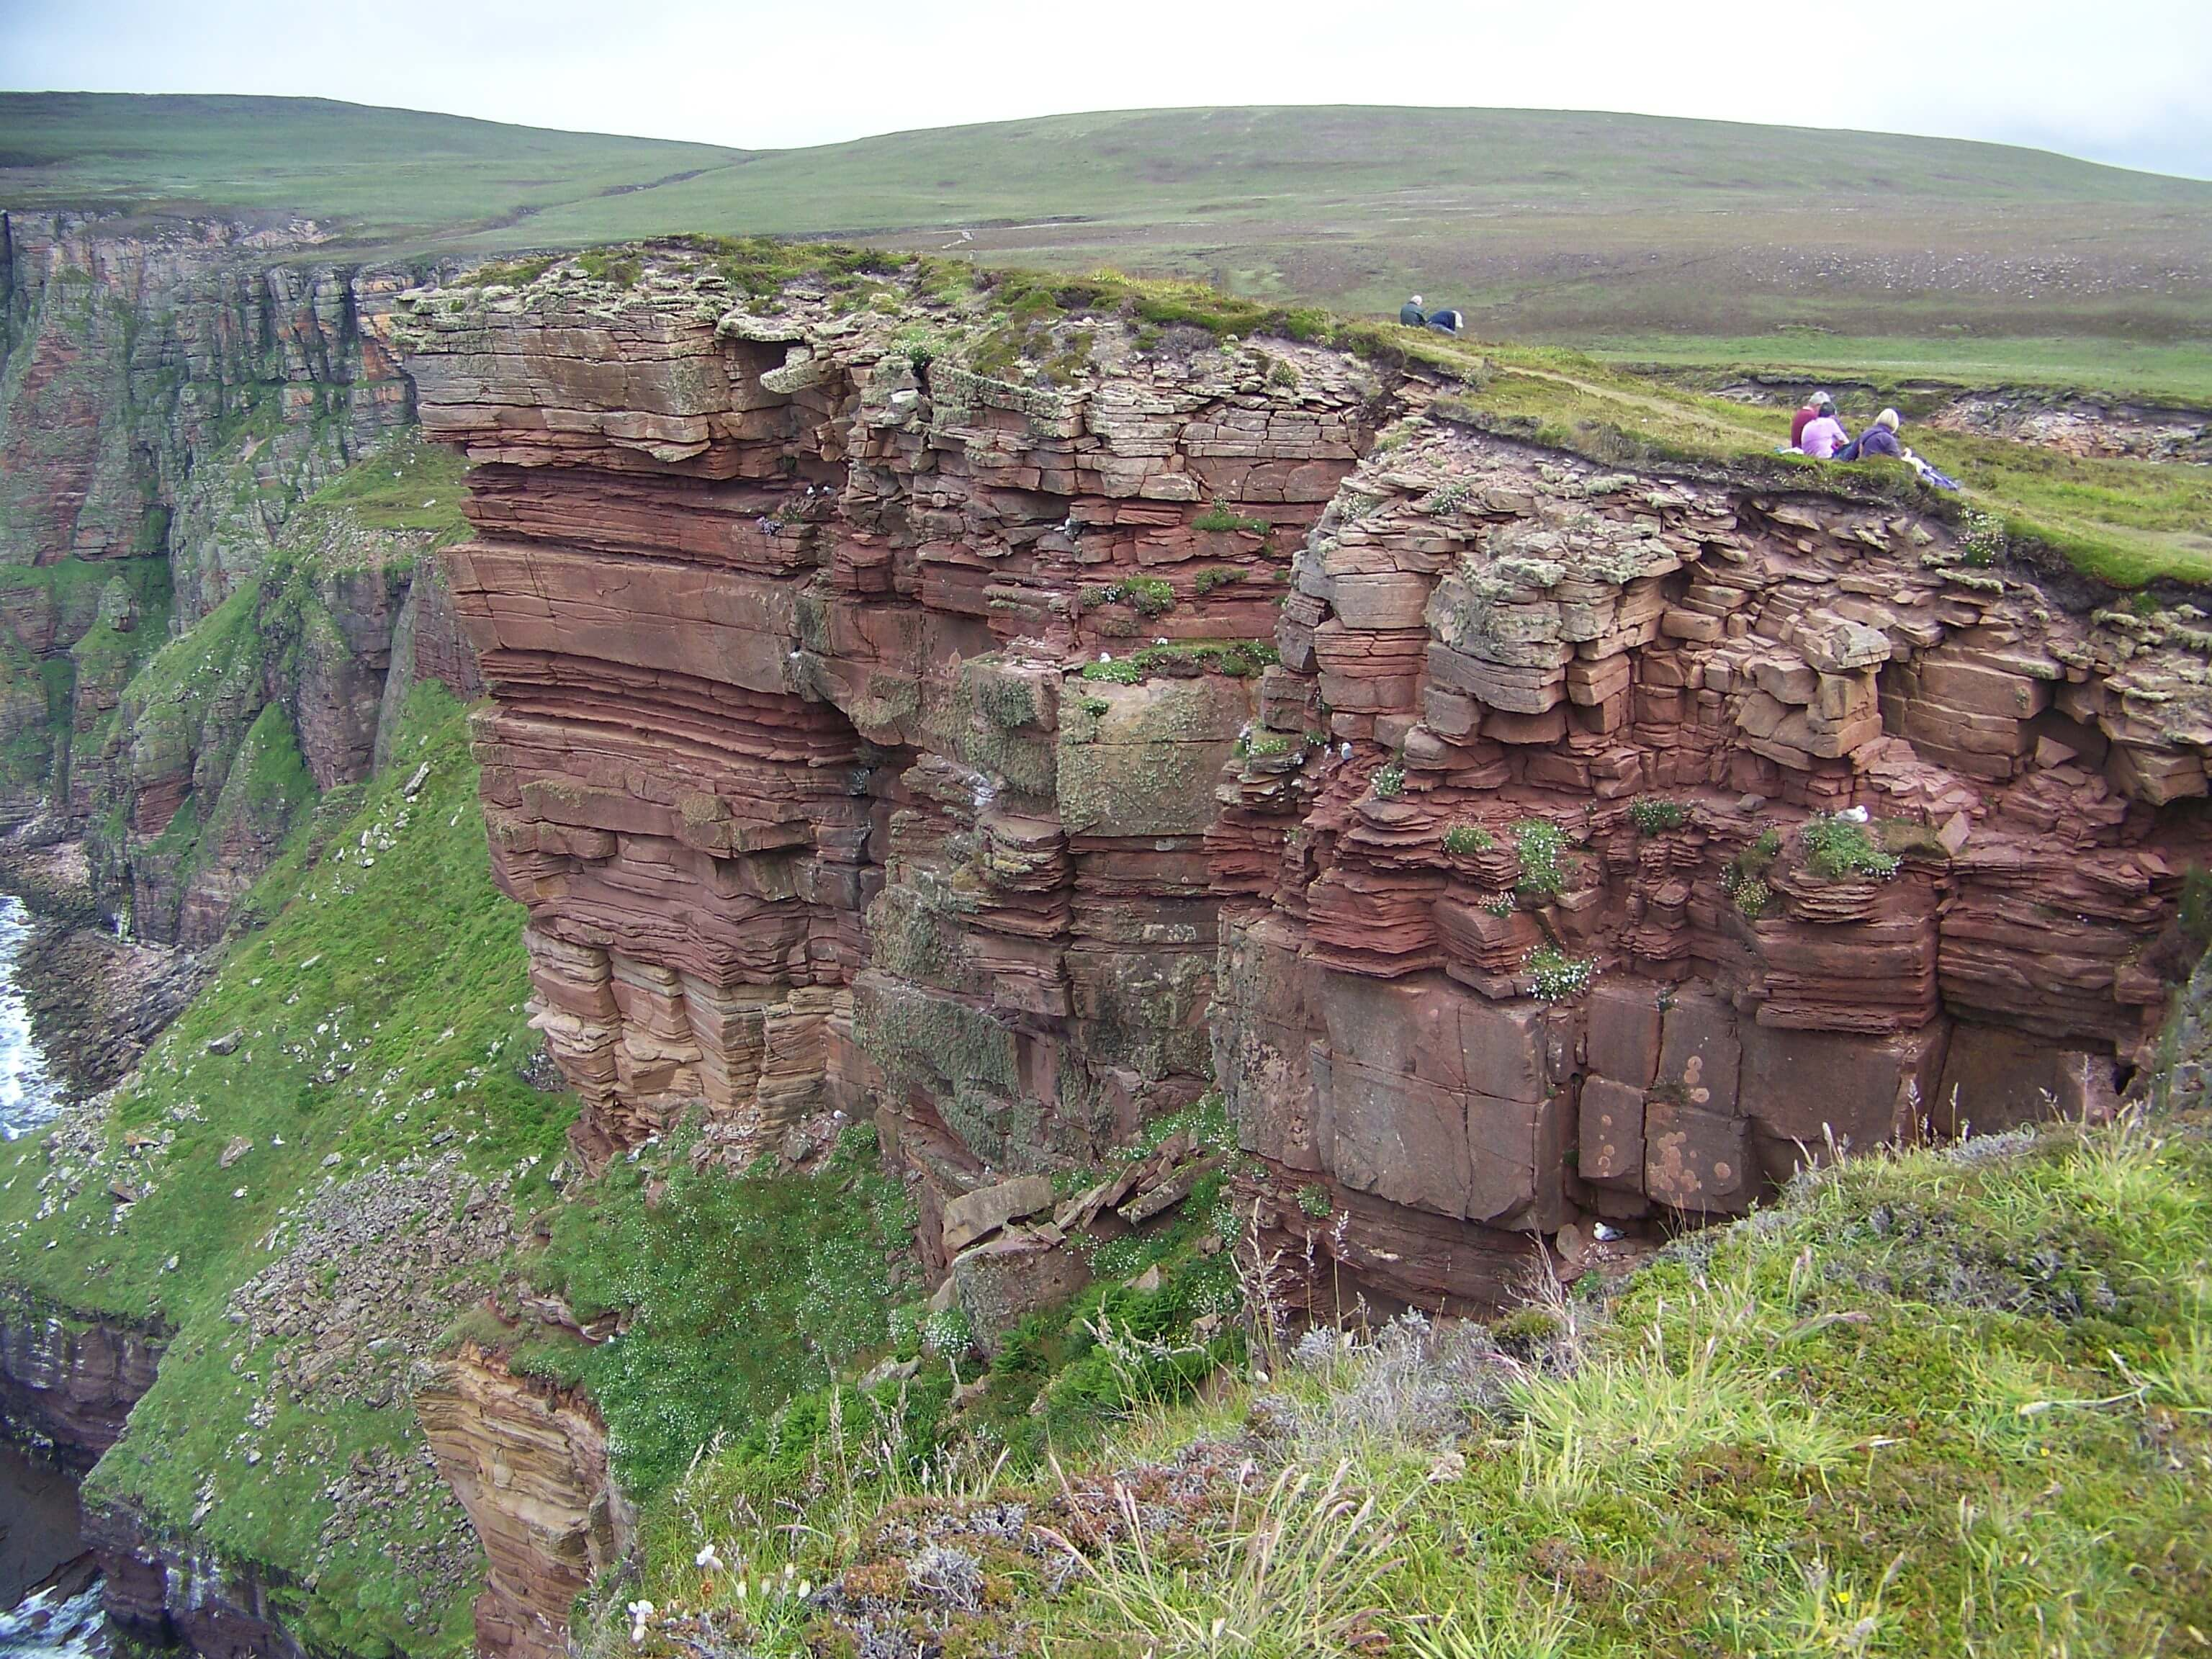 Hikers along red sandstone cliffs, Hoy, Orkney